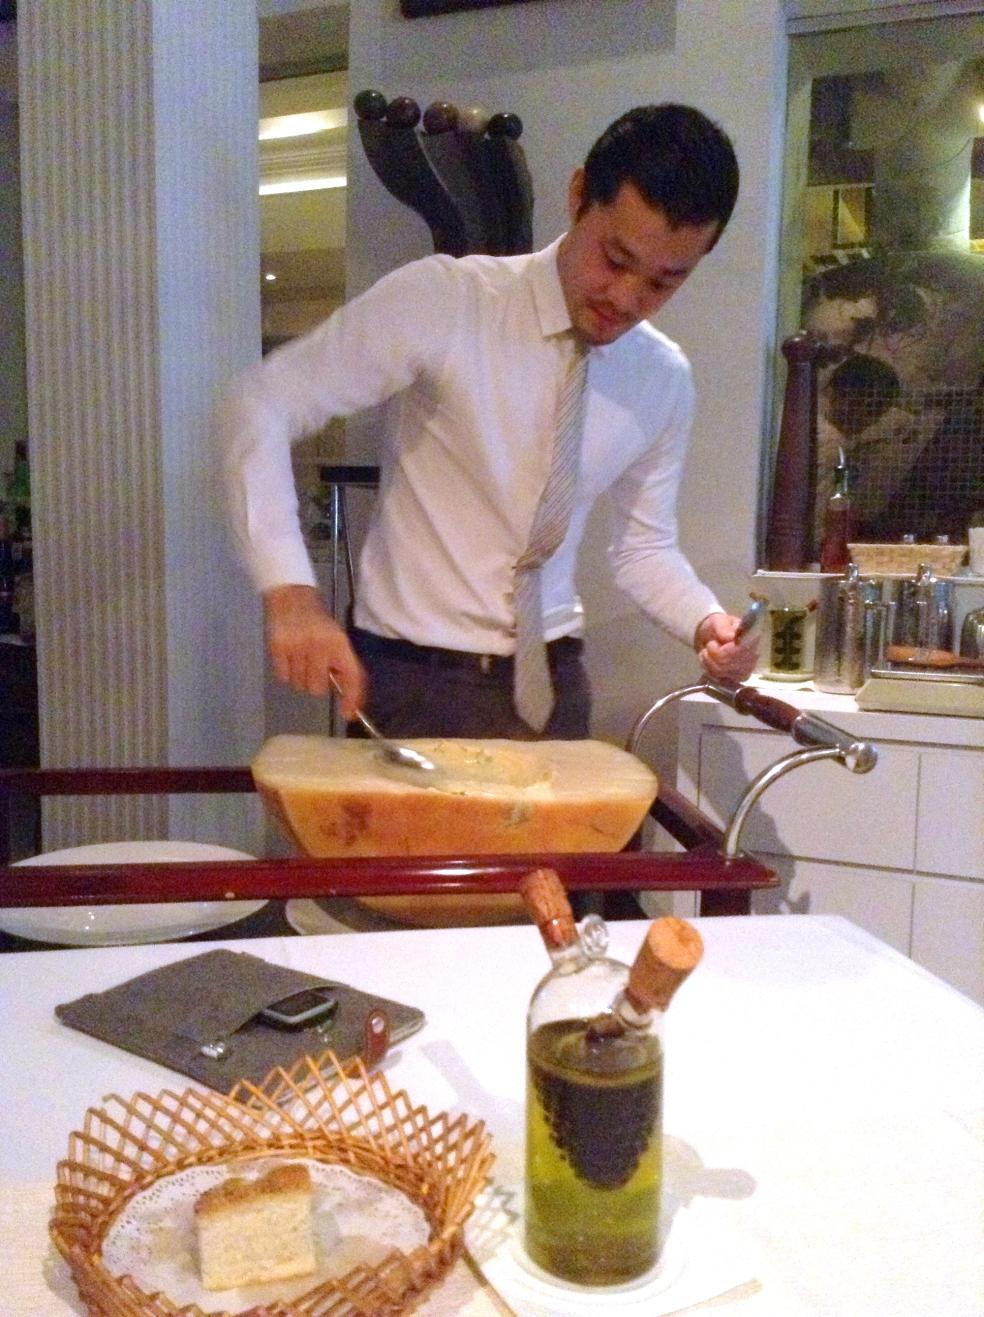 parmesan scraper